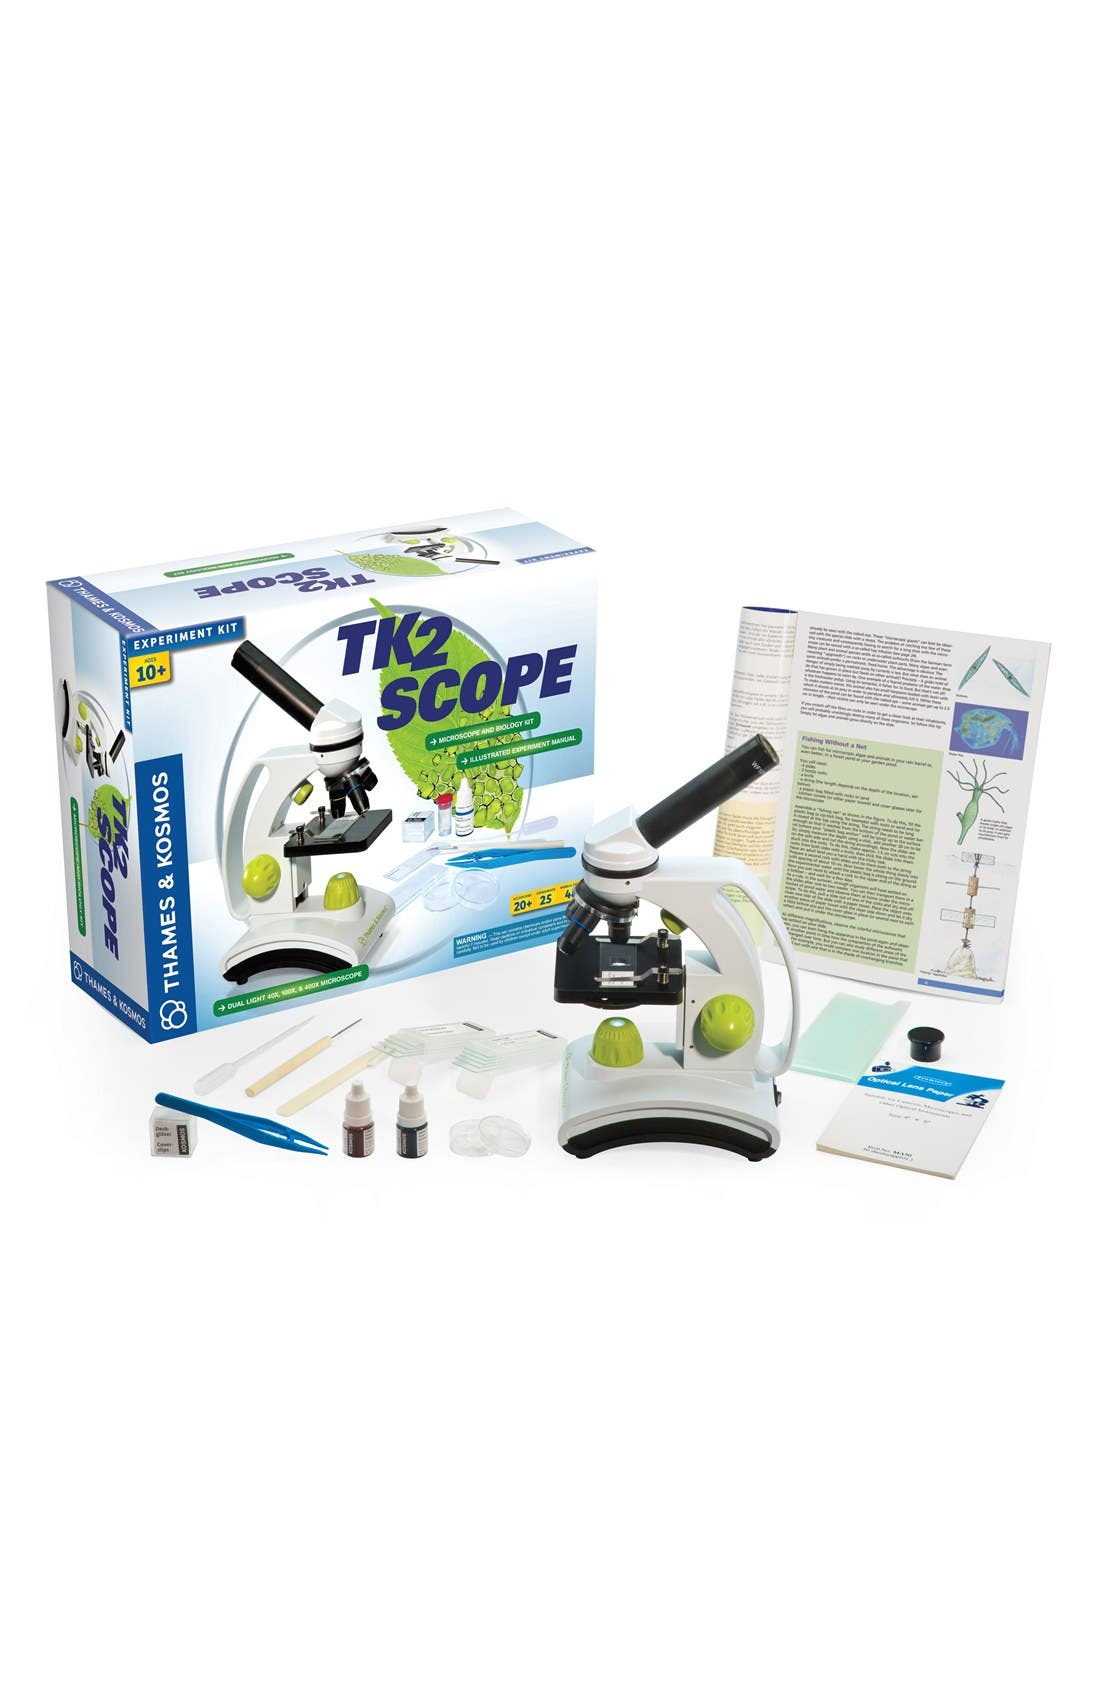 Main Image - Thames & Kosmos 'TK2 Scope' Experiment Kit